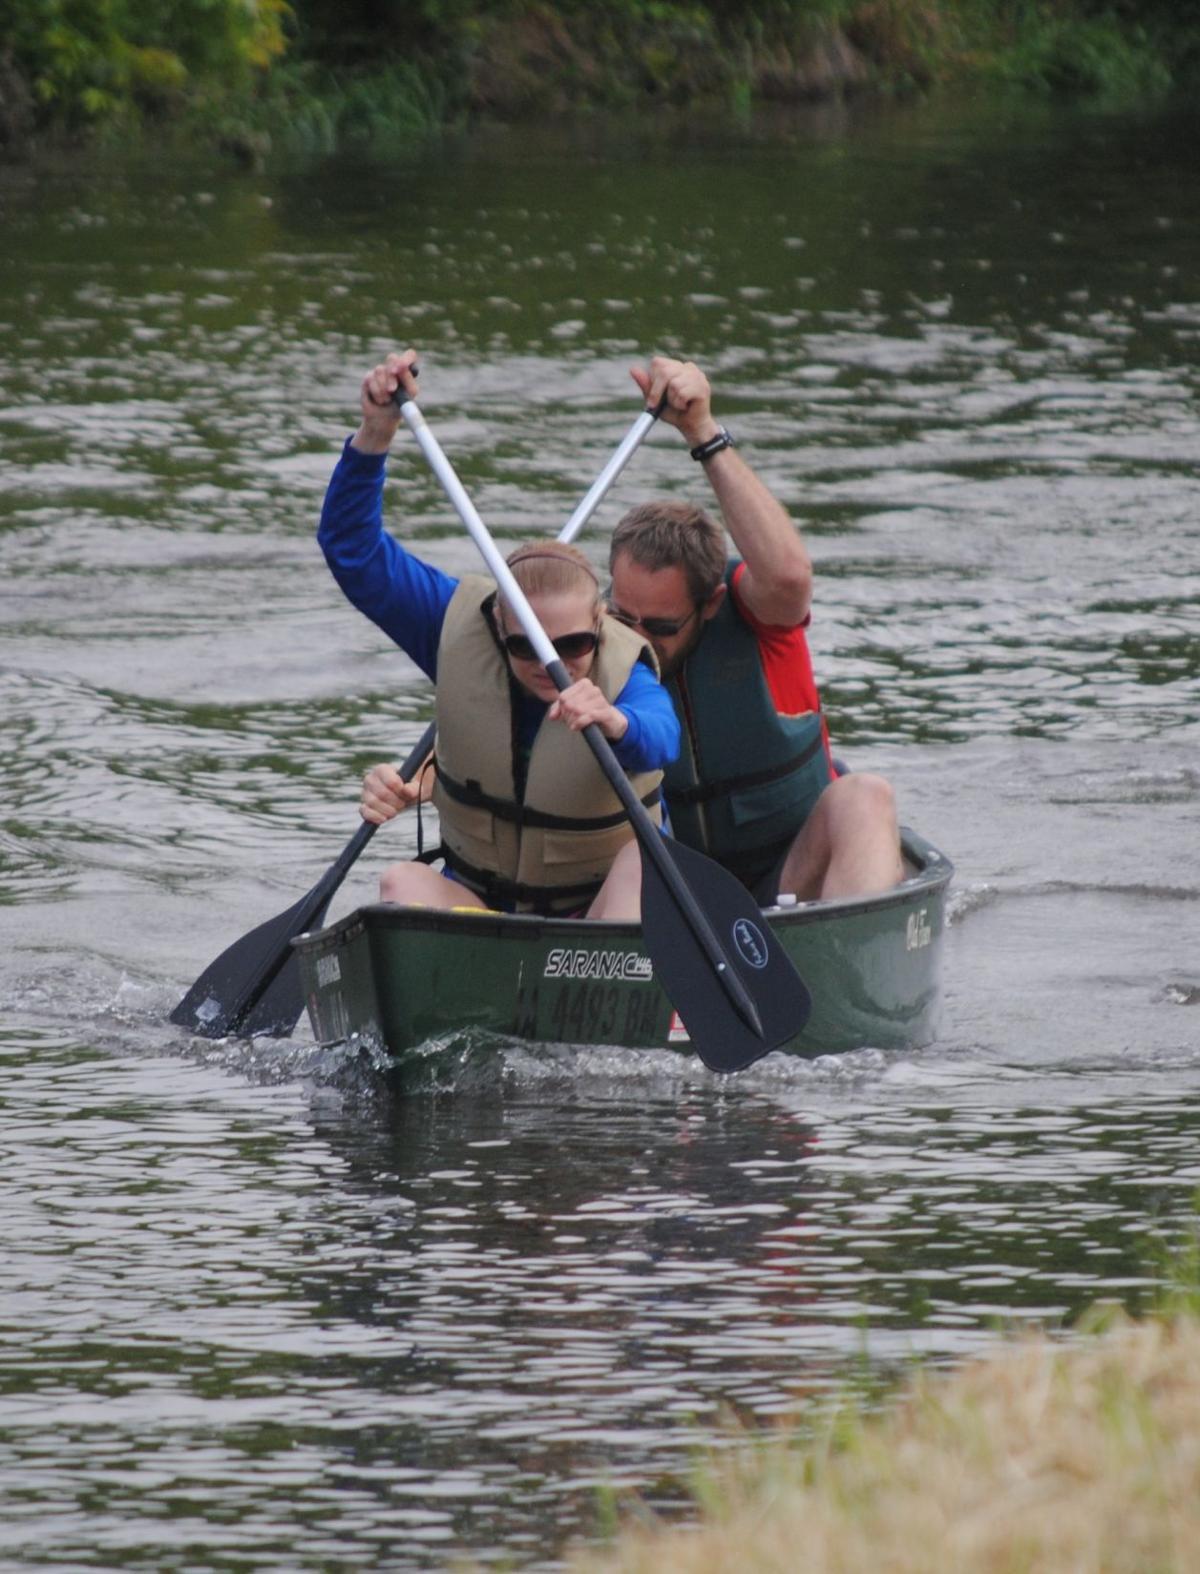 Adventure Race canoe